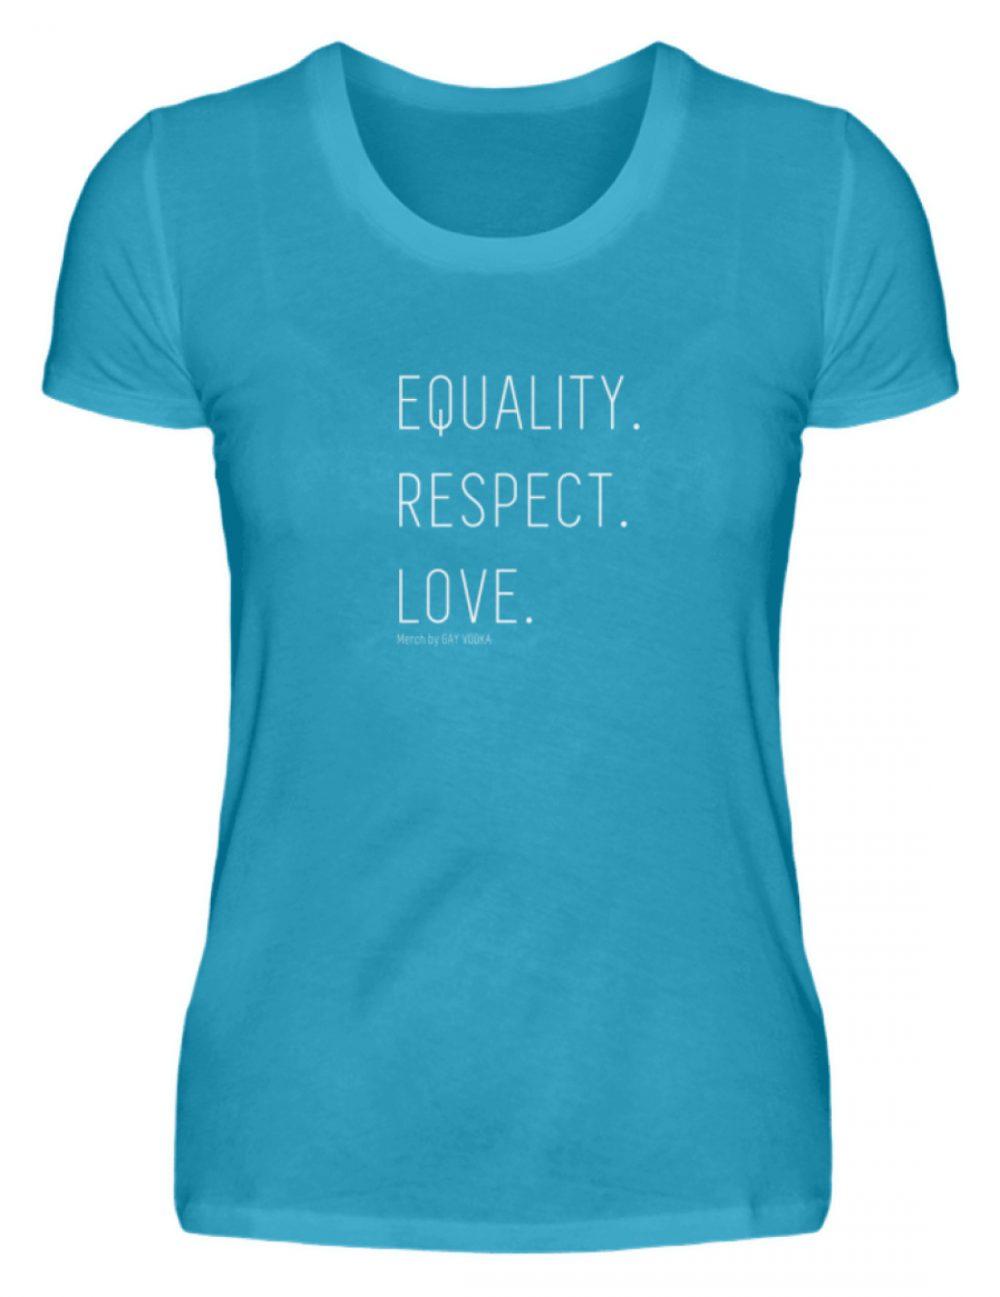 EQUALITY. RESPECT. LOVE. - Damen Premiumshirt-3175